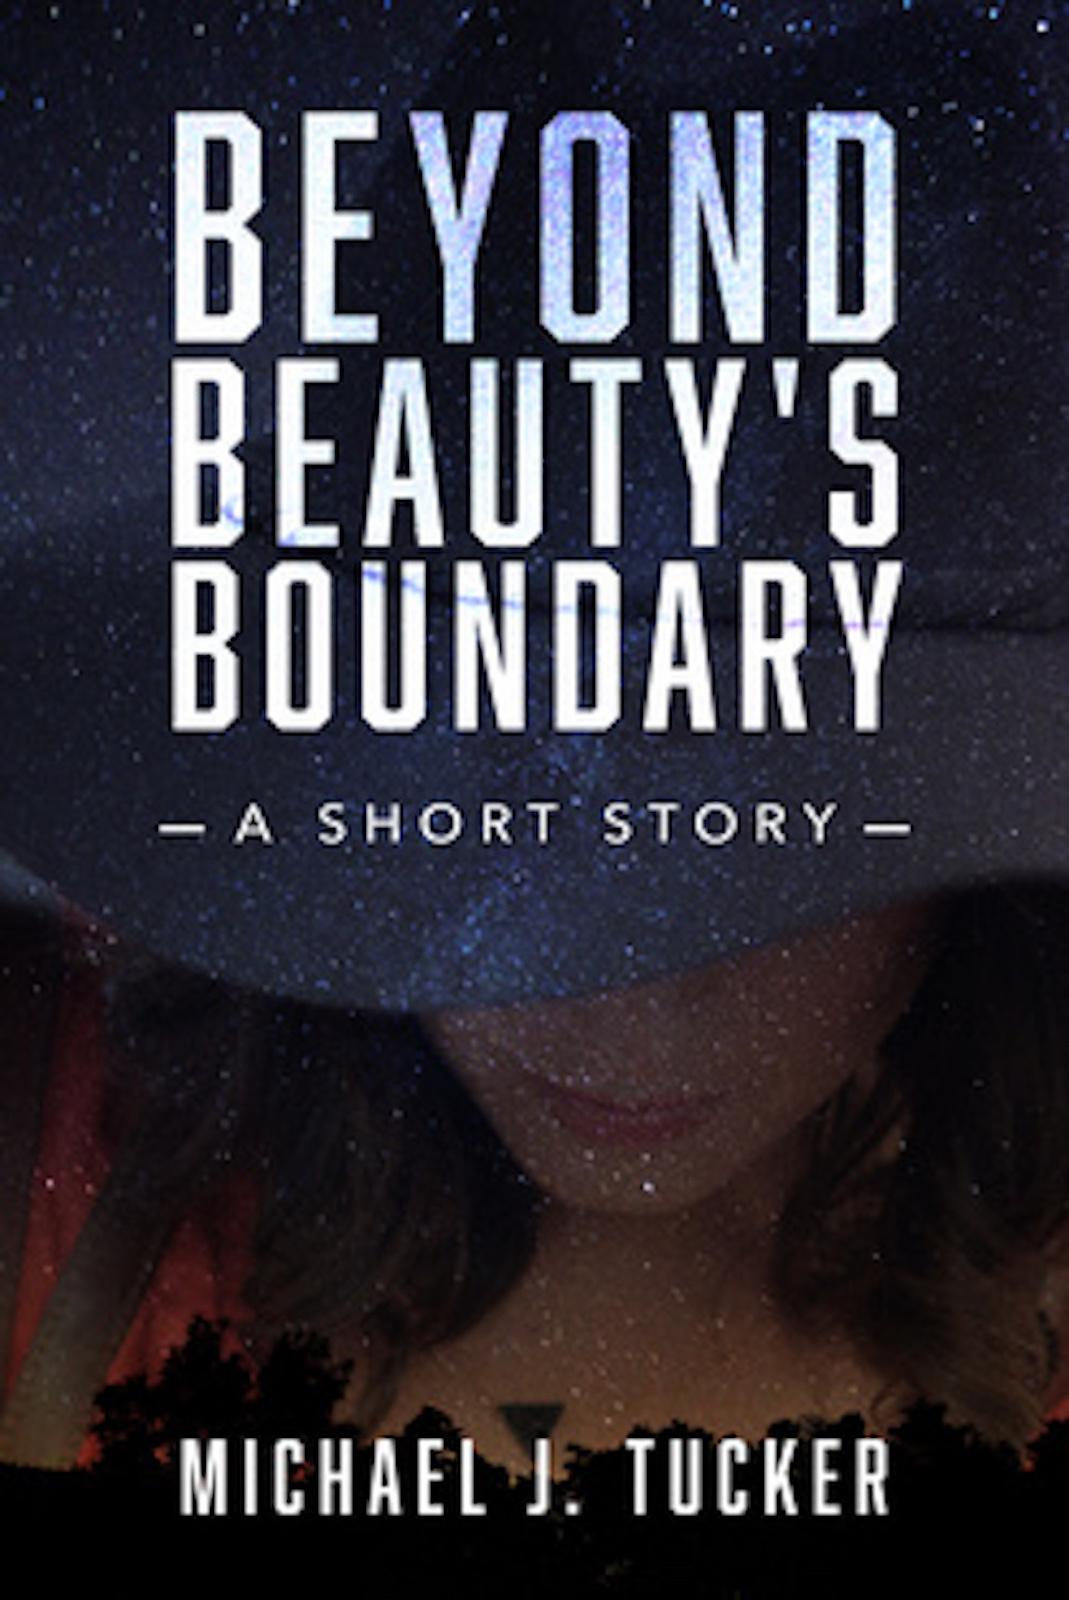 Beyond Beautys Boundary  by  Michael J.  Tucker